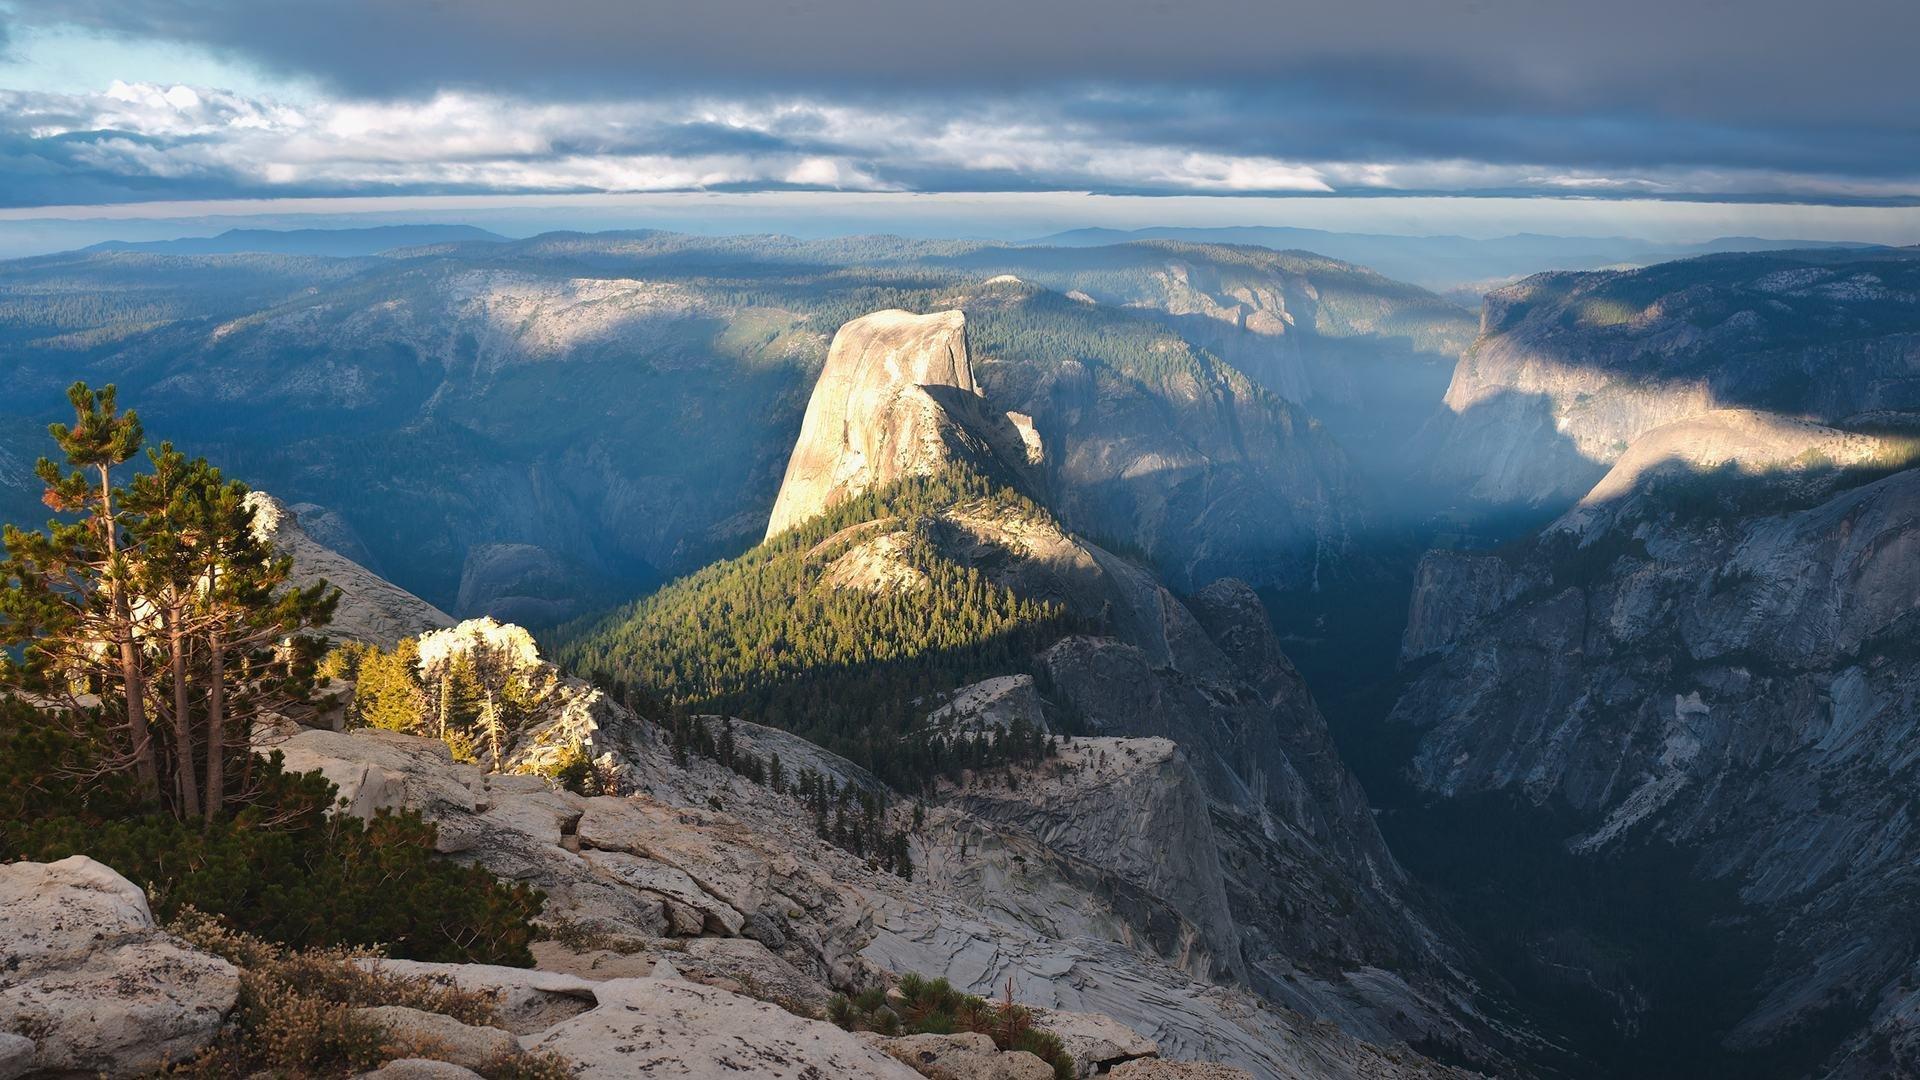 Best Wallpaper Mountain Horizon - 6a48ace1e90e6d7988e73e15db00b544  Graphic_113318.jpg